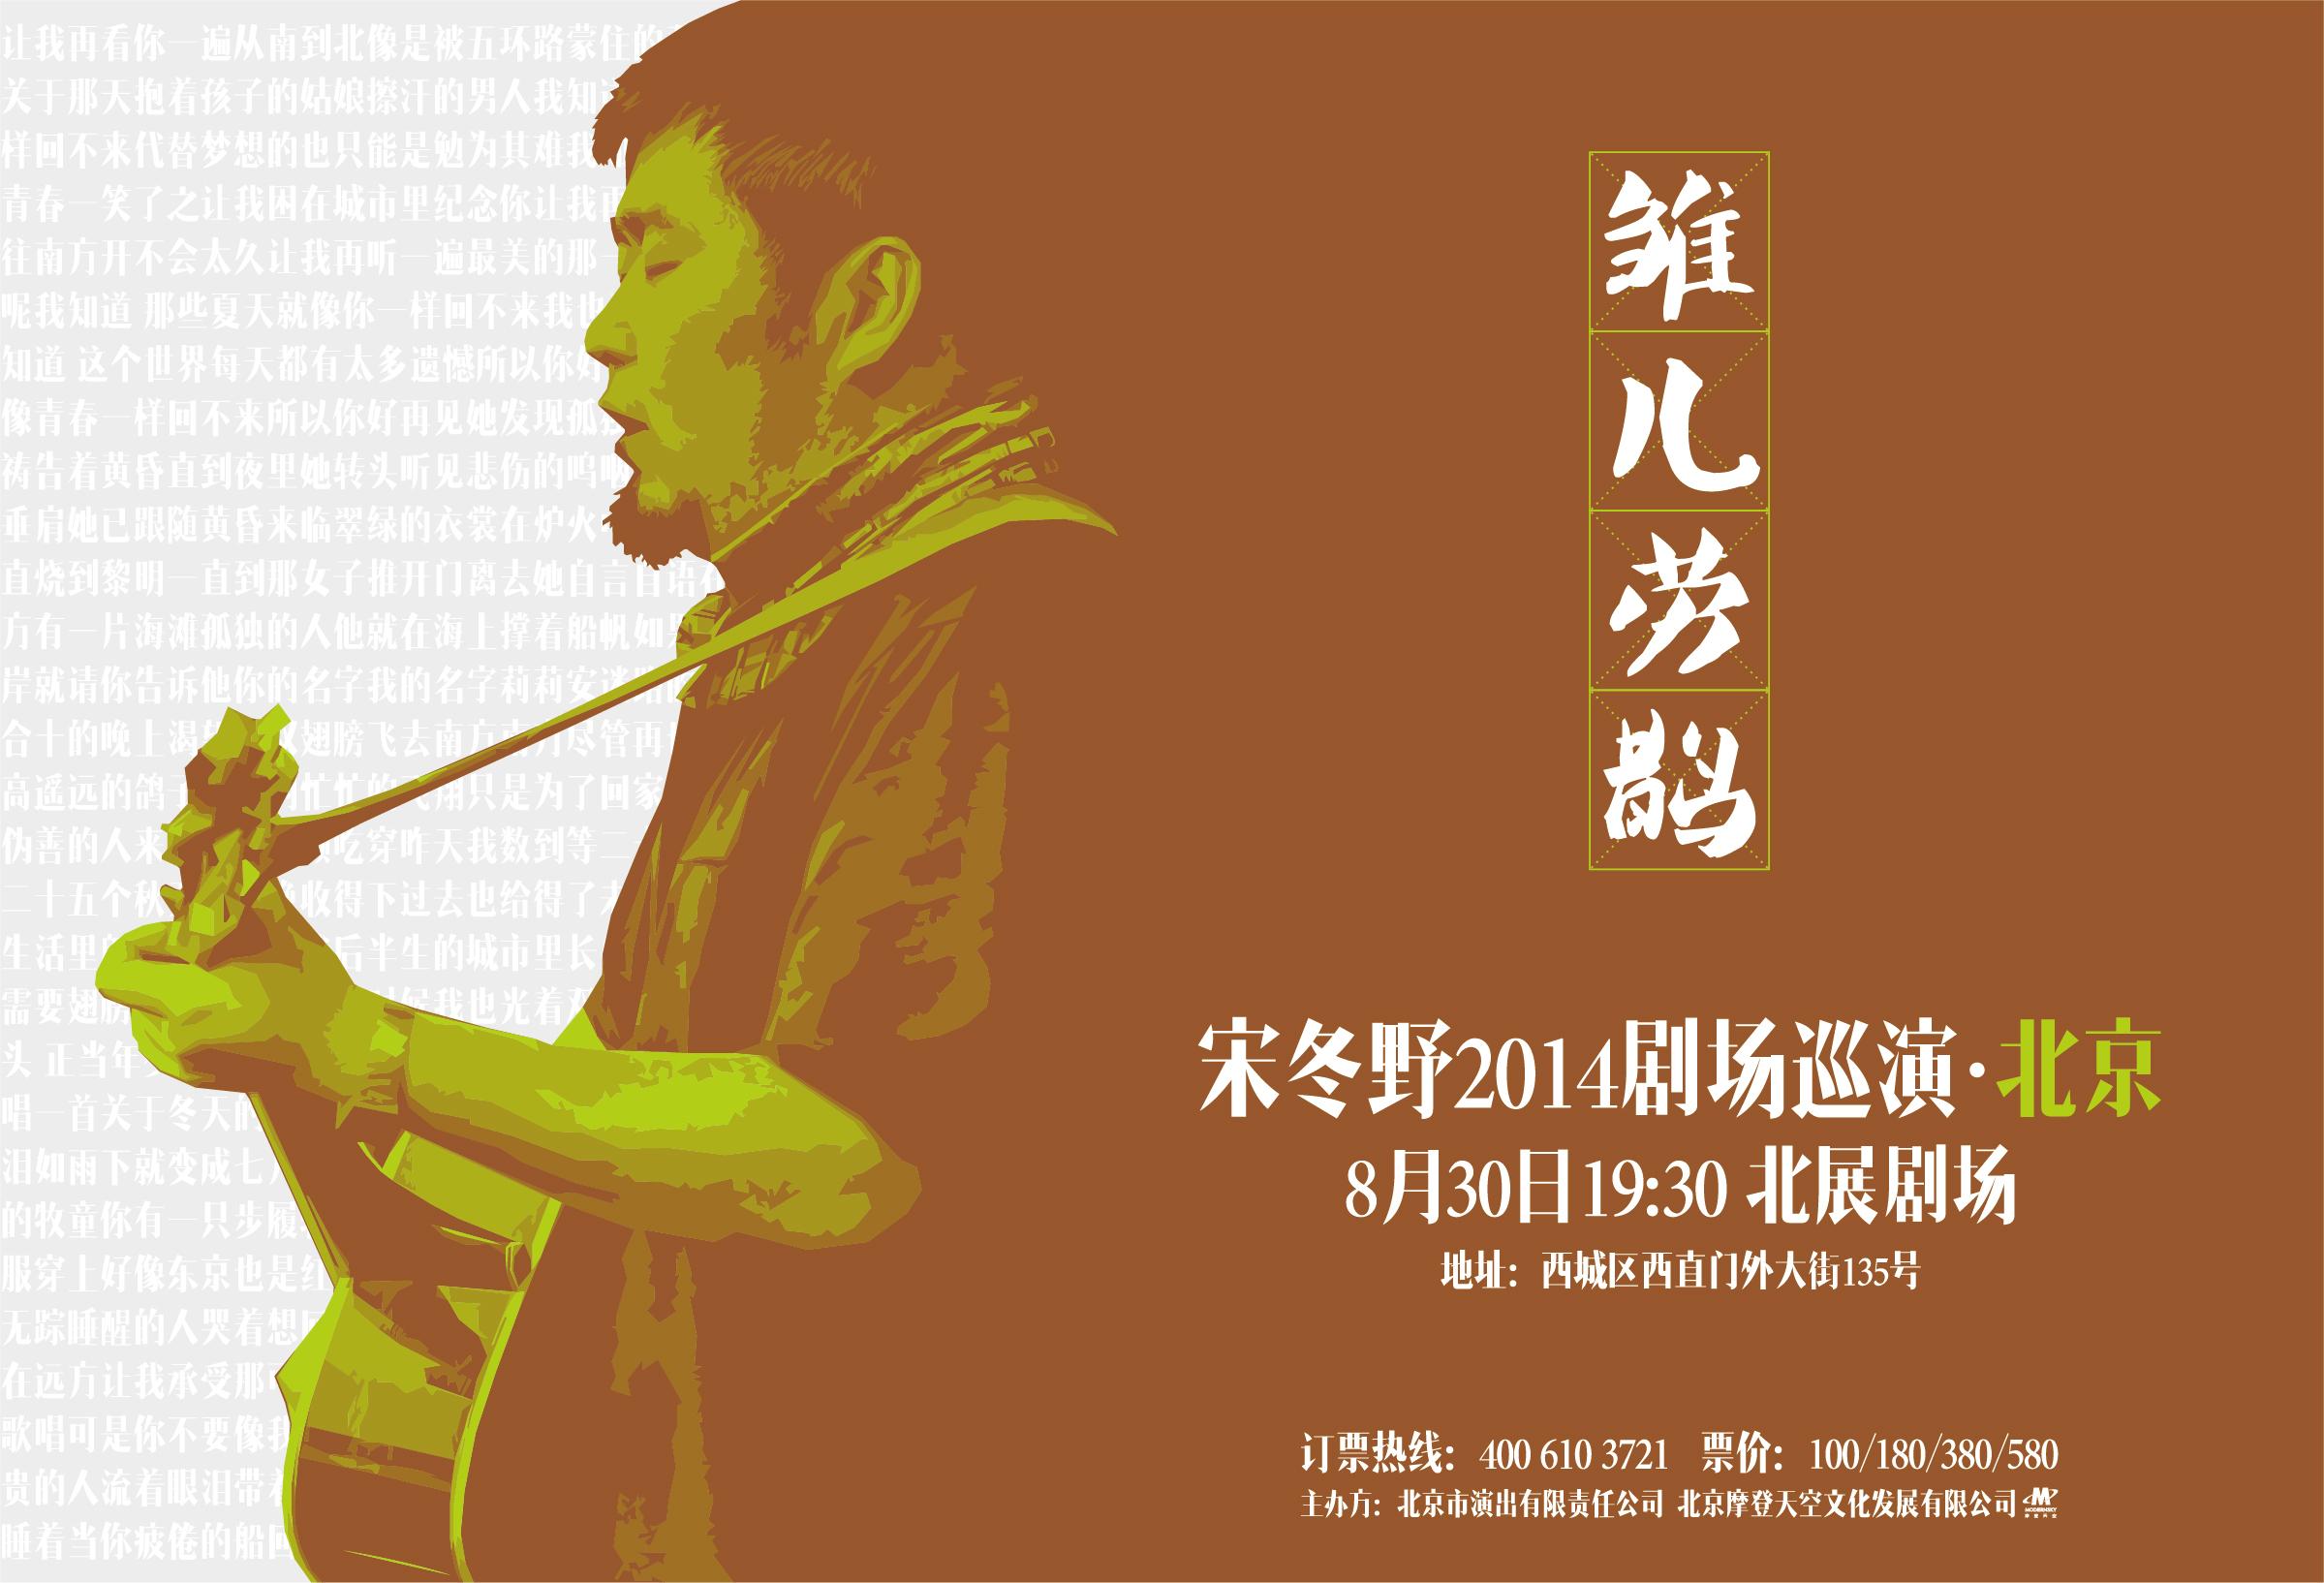 /enpproperty-->  宋冬野演出海报。 8月30日,北京北展剧场,宋冬野百城巡演升级版,2014雏儿劳鹊全国剧场巡演即将在此拉开华美而厚重的帷幕。 礼失而求诸野,当业已体制化的主流乐界创作力渐趋萎靡,陷入沉滞僵化、了无生气的泥淖,筚路蓝缕的独立音乐人以革命性的姿态播下星星之火,迅速燎原于大江南北,海峡两岸,这便是从去年起人们津津乐道的宋冬野现象。冬野自称乐坛稚嫩雏儿,但历经《安和桥北》的爆炸性效应和百城巡演的洗礼,雏鸟奋飞化身劳鹊,得闻喜讯之人均已看到,这安澜平和的啼鸣已插